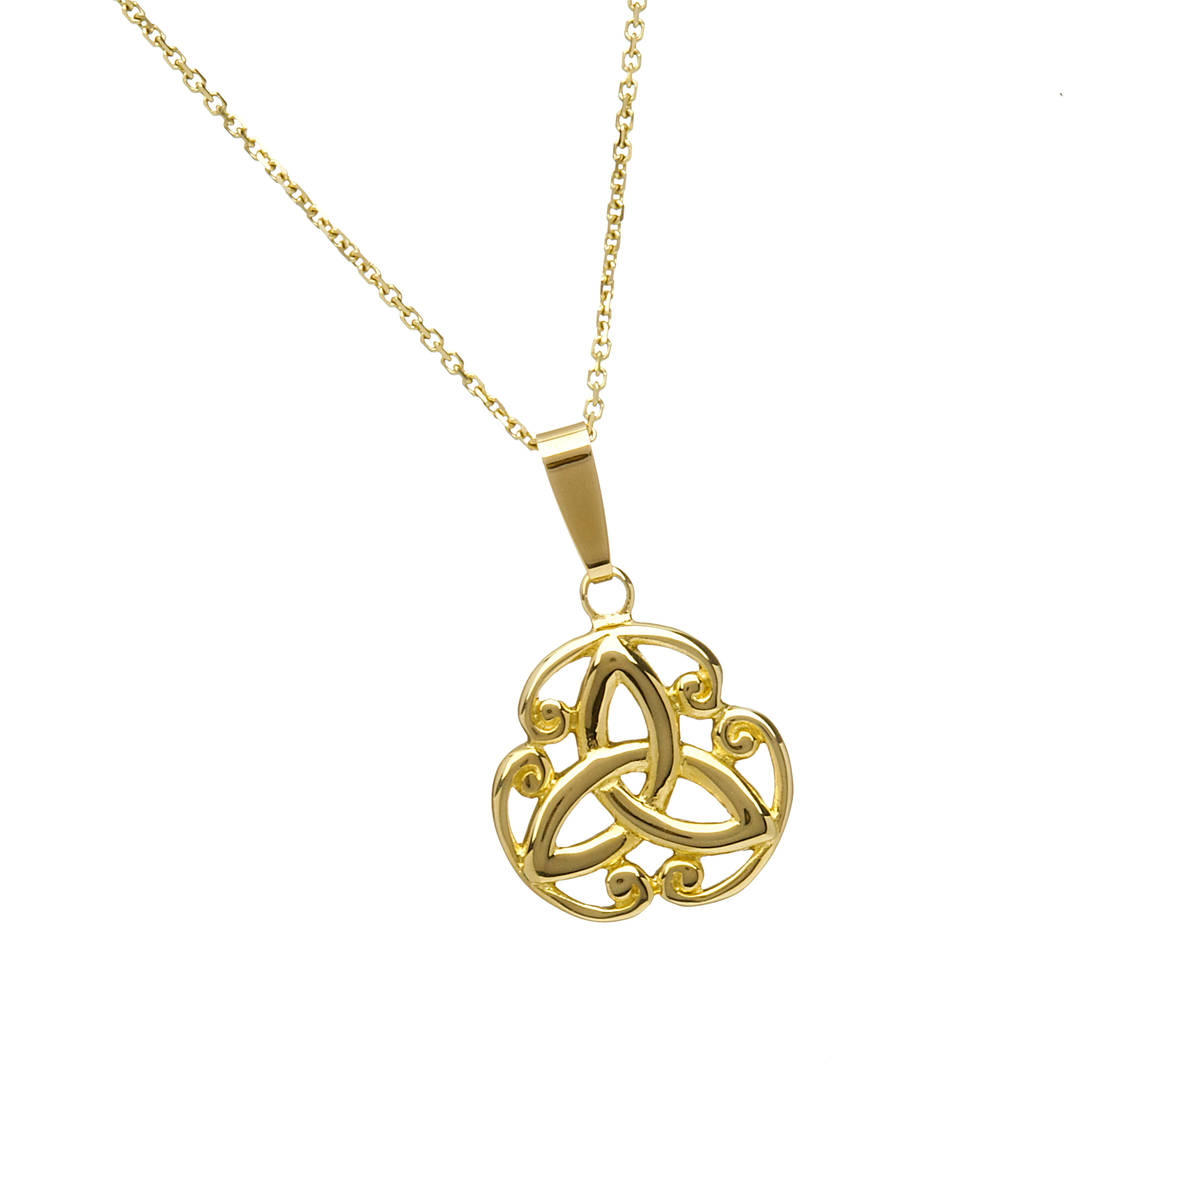 10 carat yellow gold filigree celtic knot pendant.